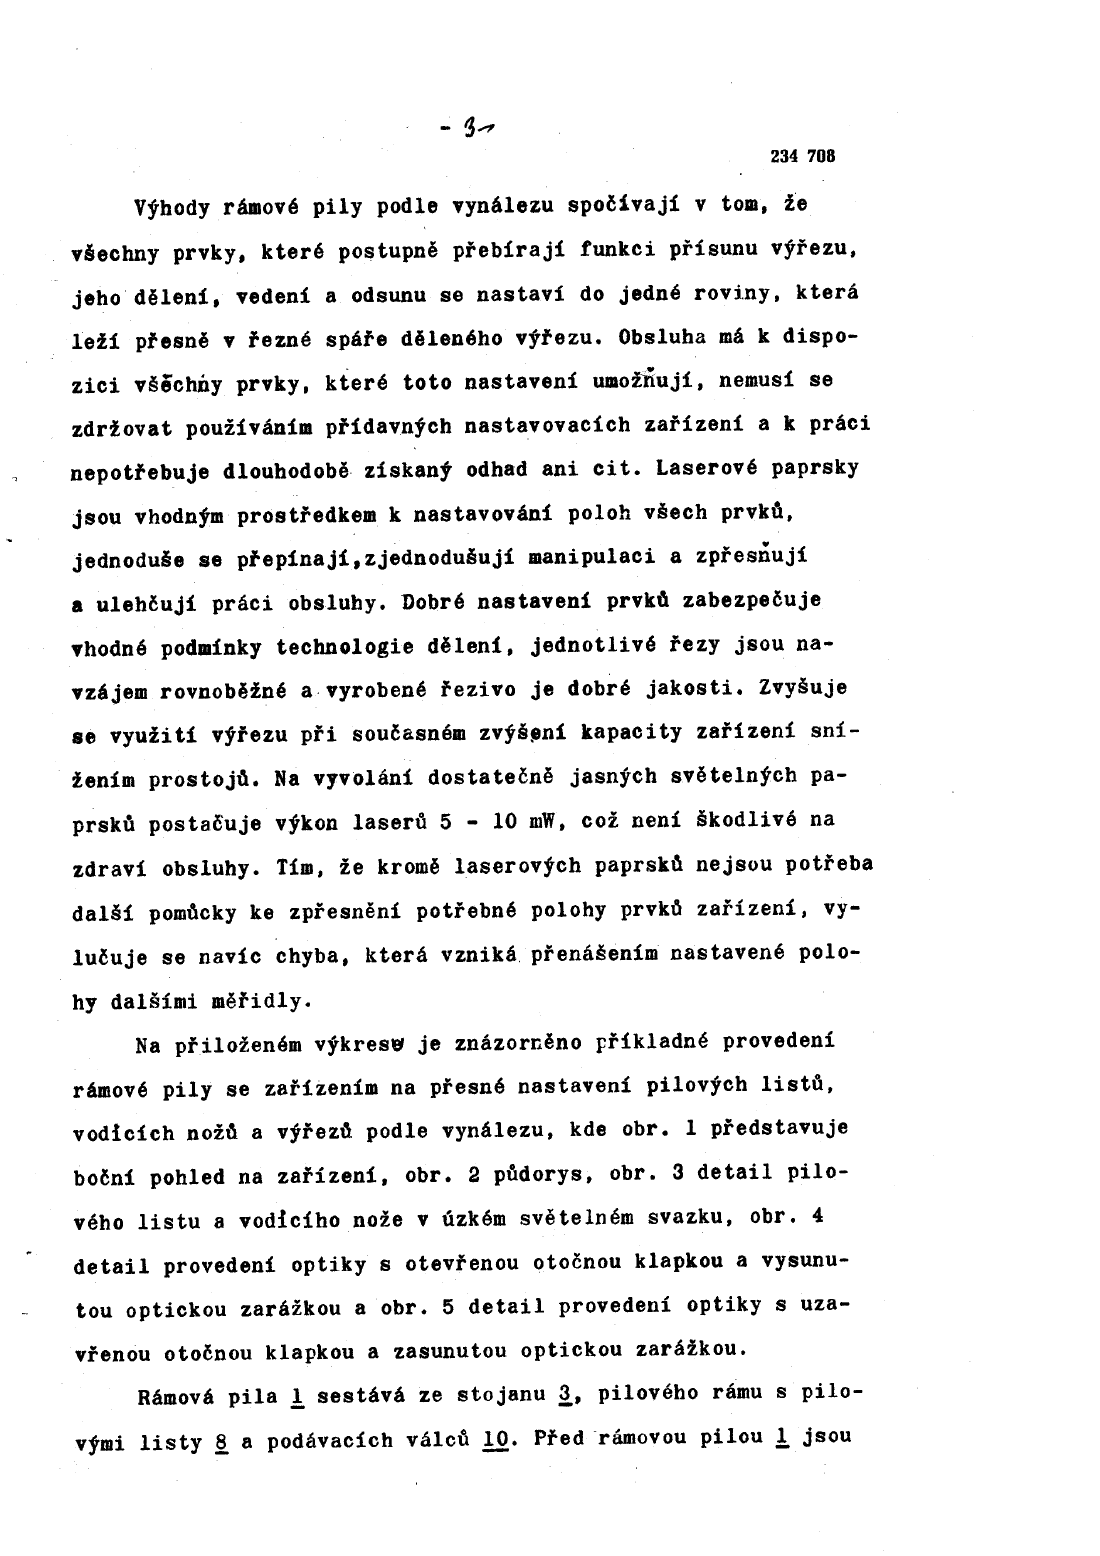 Ramova Pila Se Zarizenim Na Presne Nastaveni Pilovych Listu